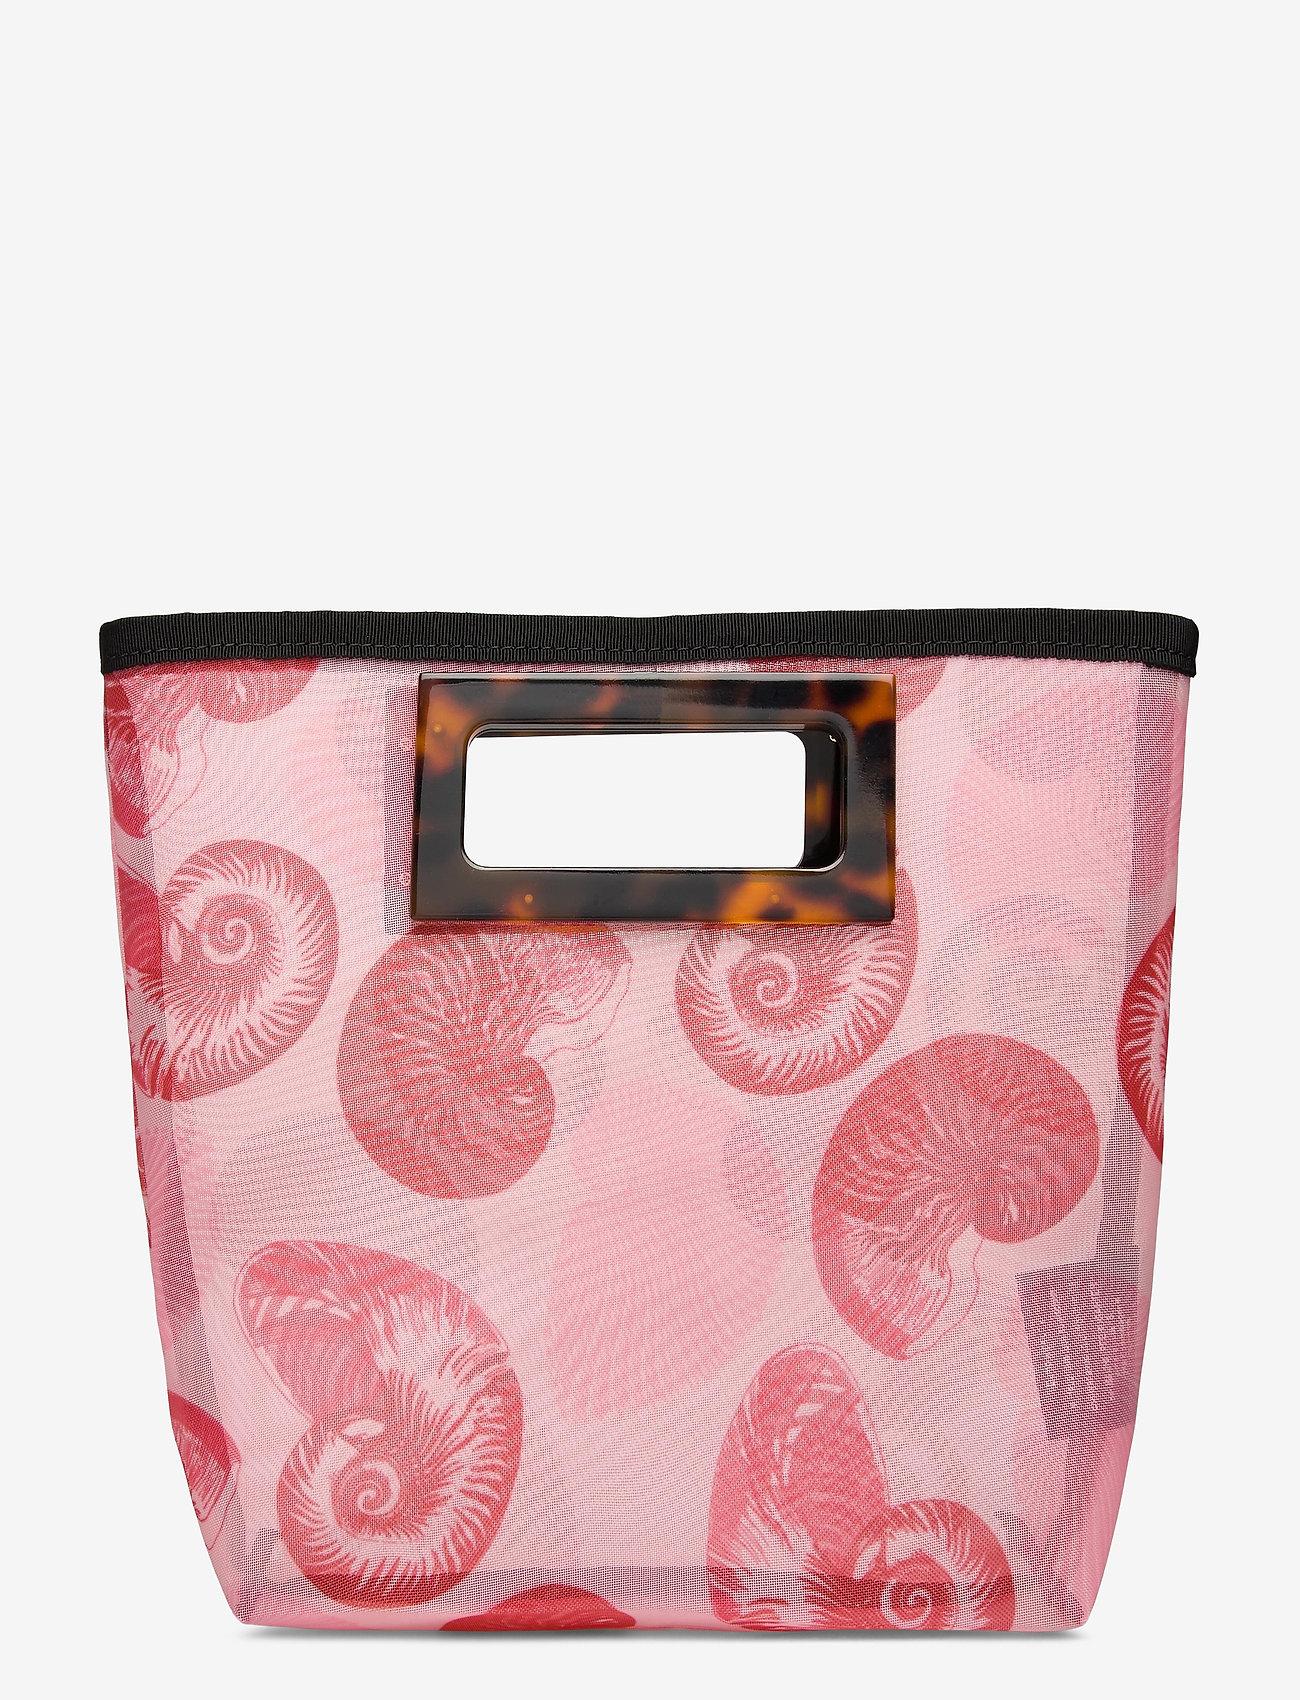 Baum und Pferdgarten - KATE - handbags - pink shell wallpaper - 1